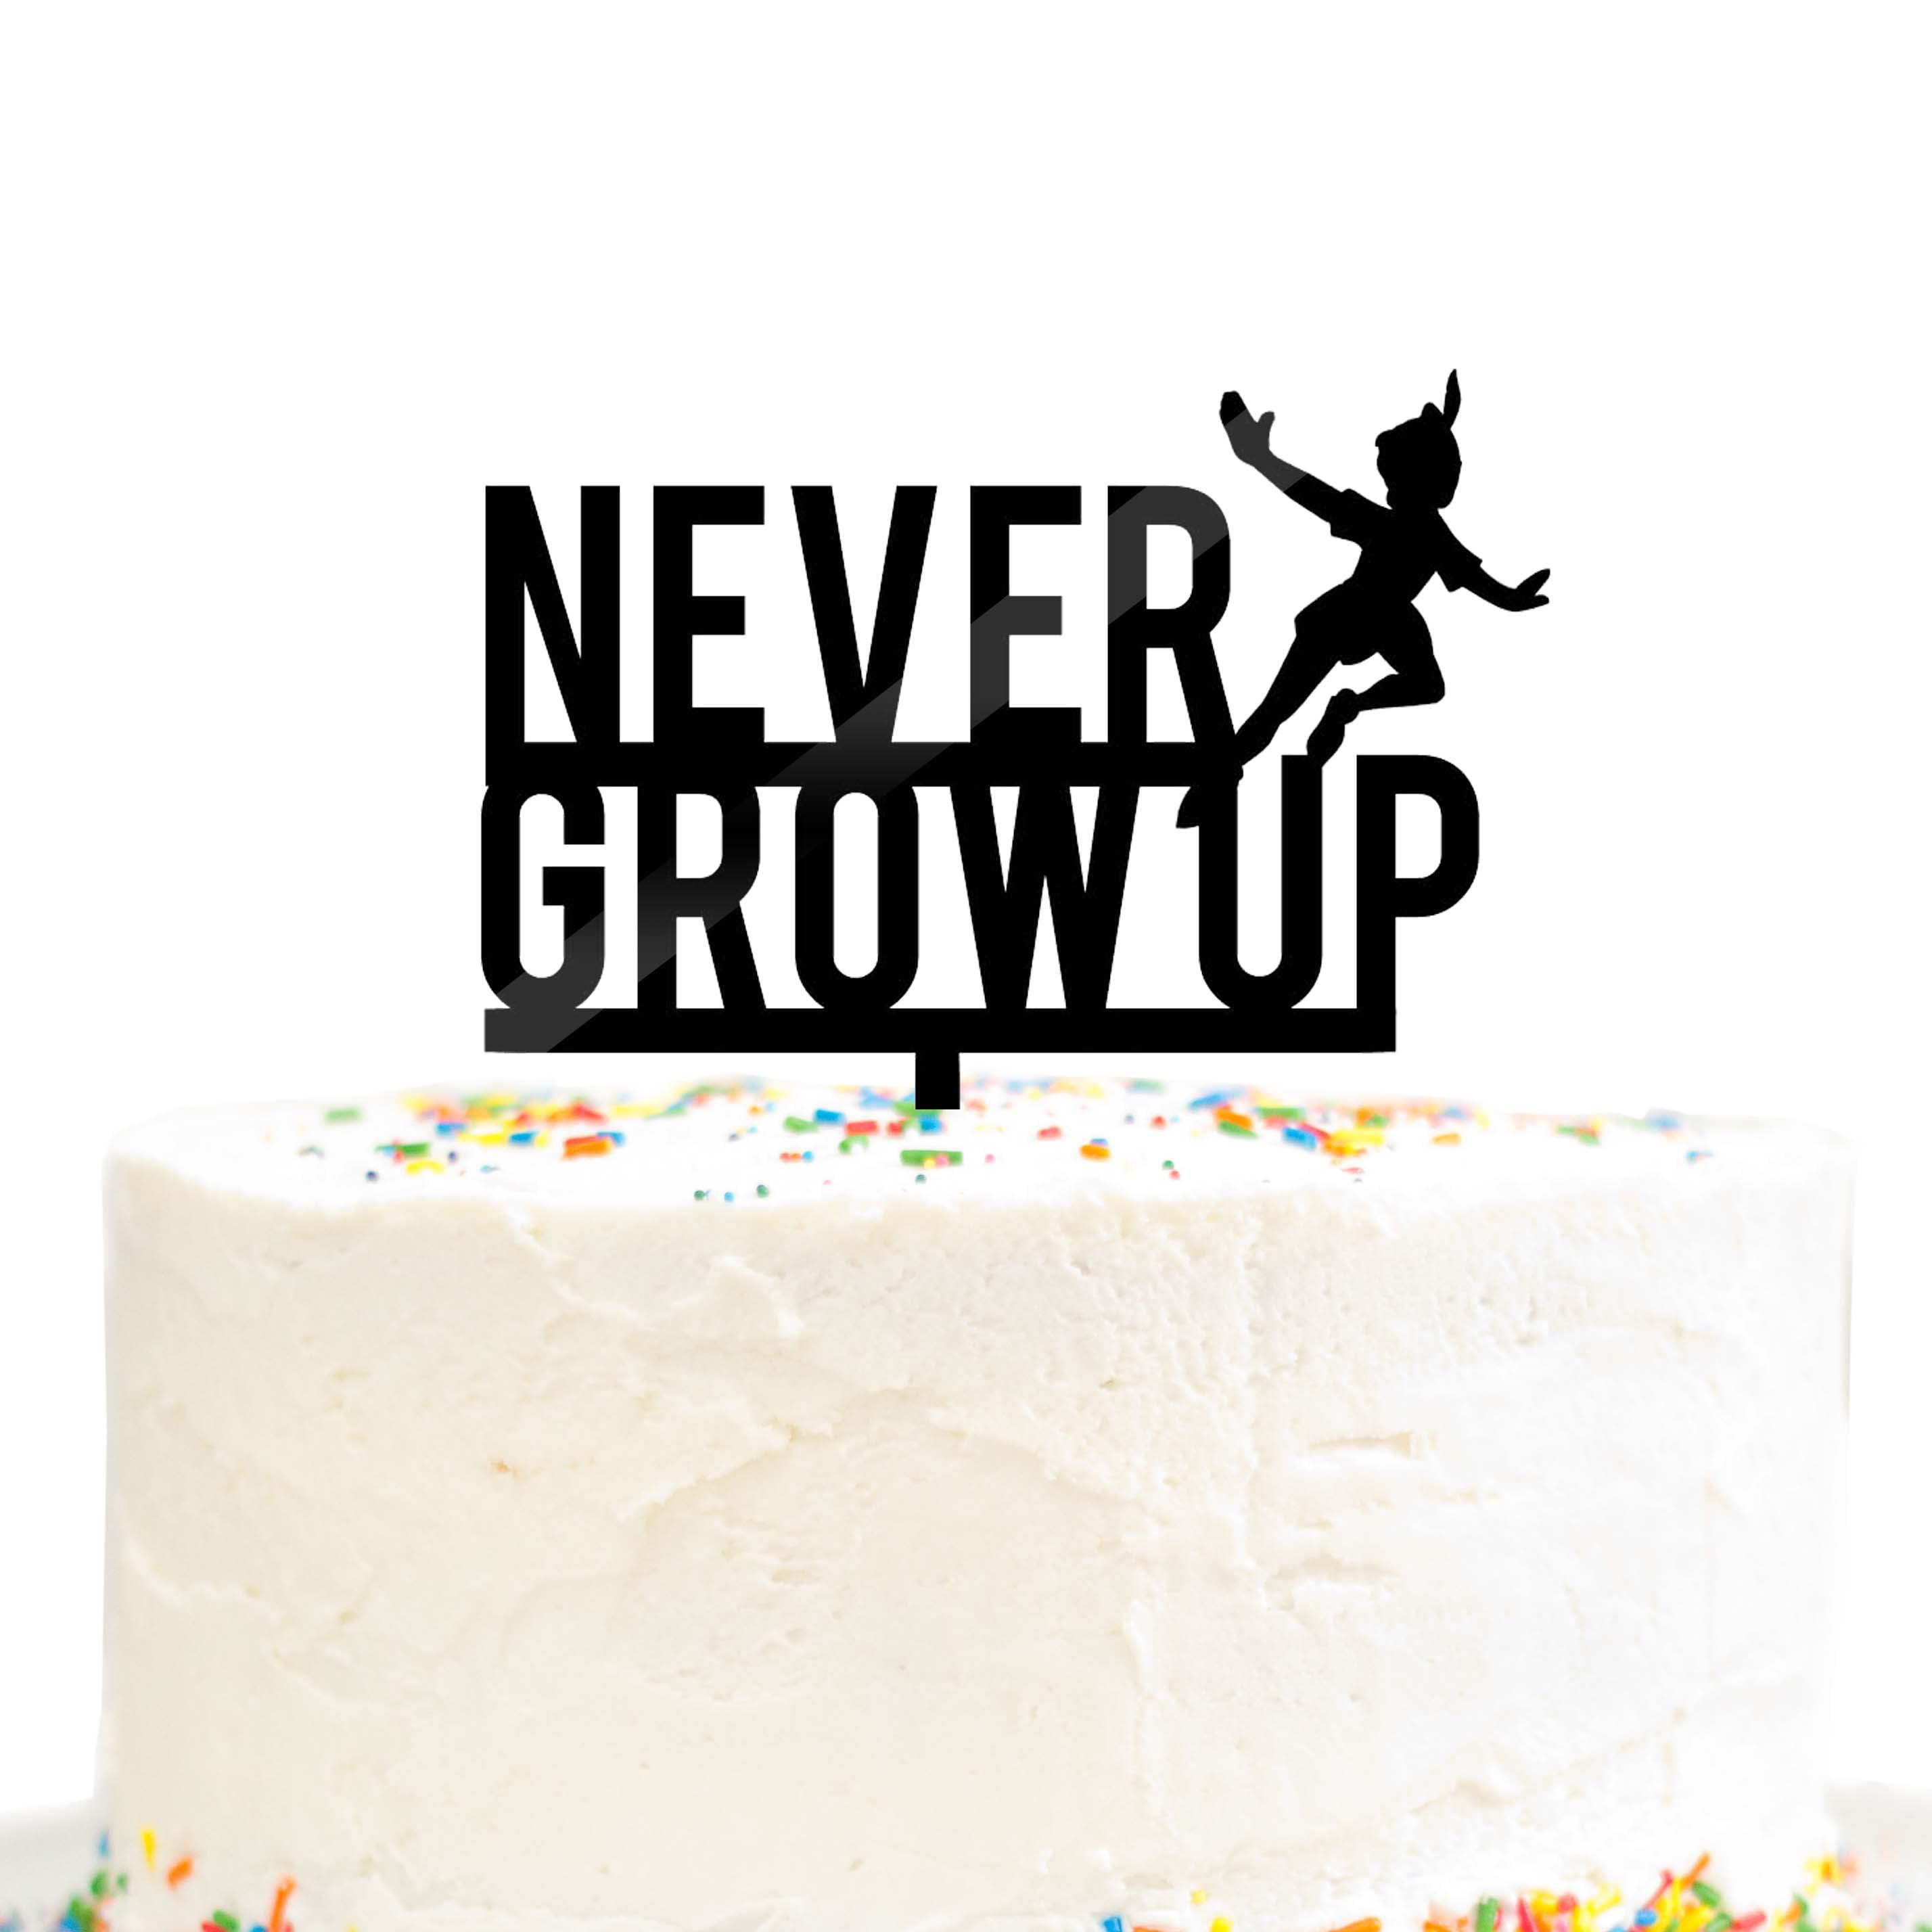 Marvelous Never Grow Up Birthday Cake Topper Black Acrylic Peter Pan Party Funny Birthday Cards Online Benoljebrpdamsfinfo